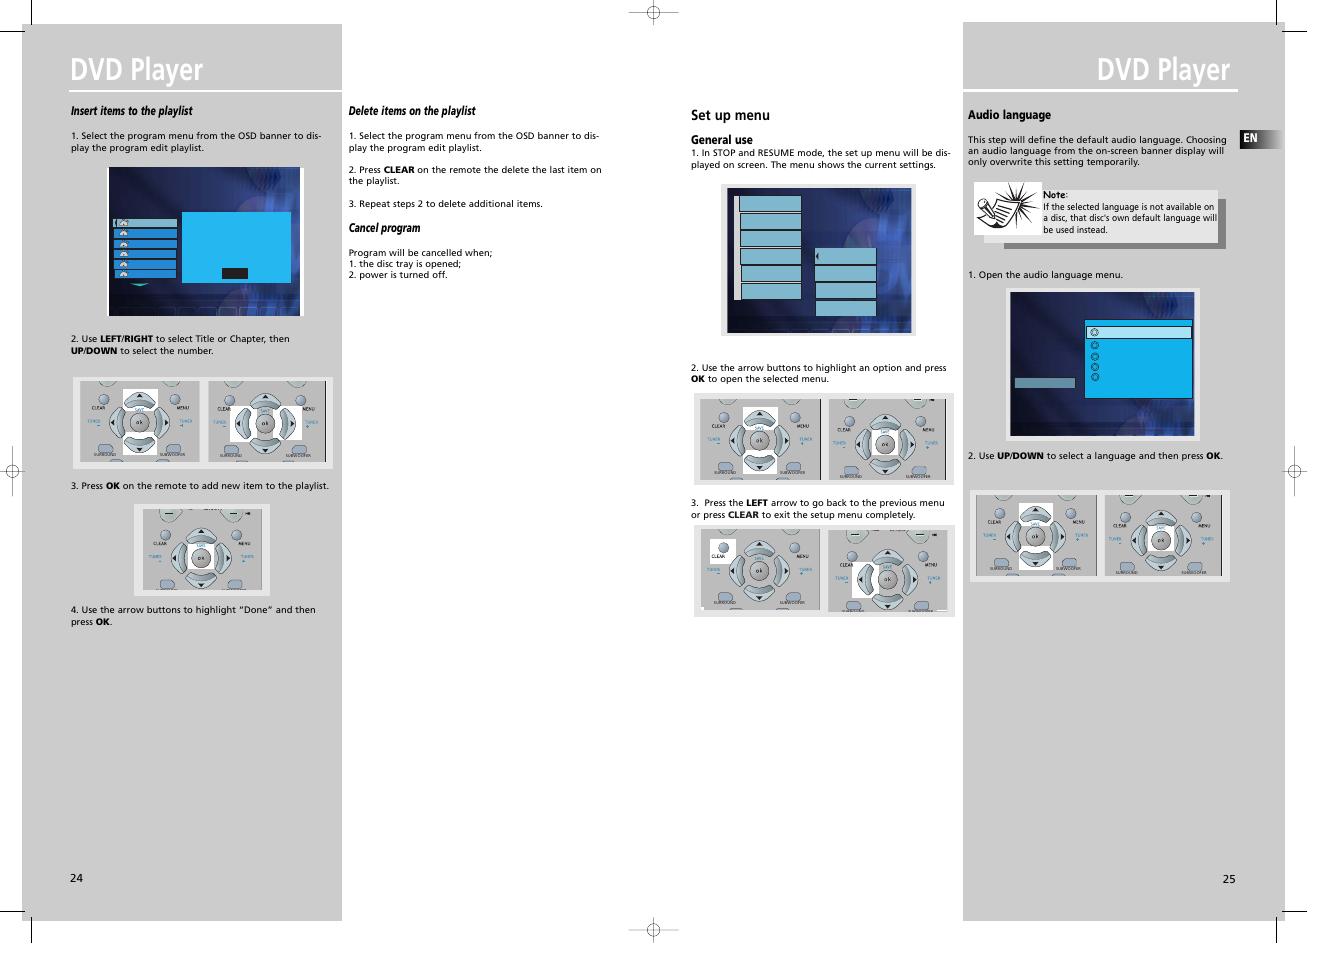 dvd player set up menu insert items to the playlist technicolor rh manualsdir com JVC Instruction Manuals DVD User Manuals